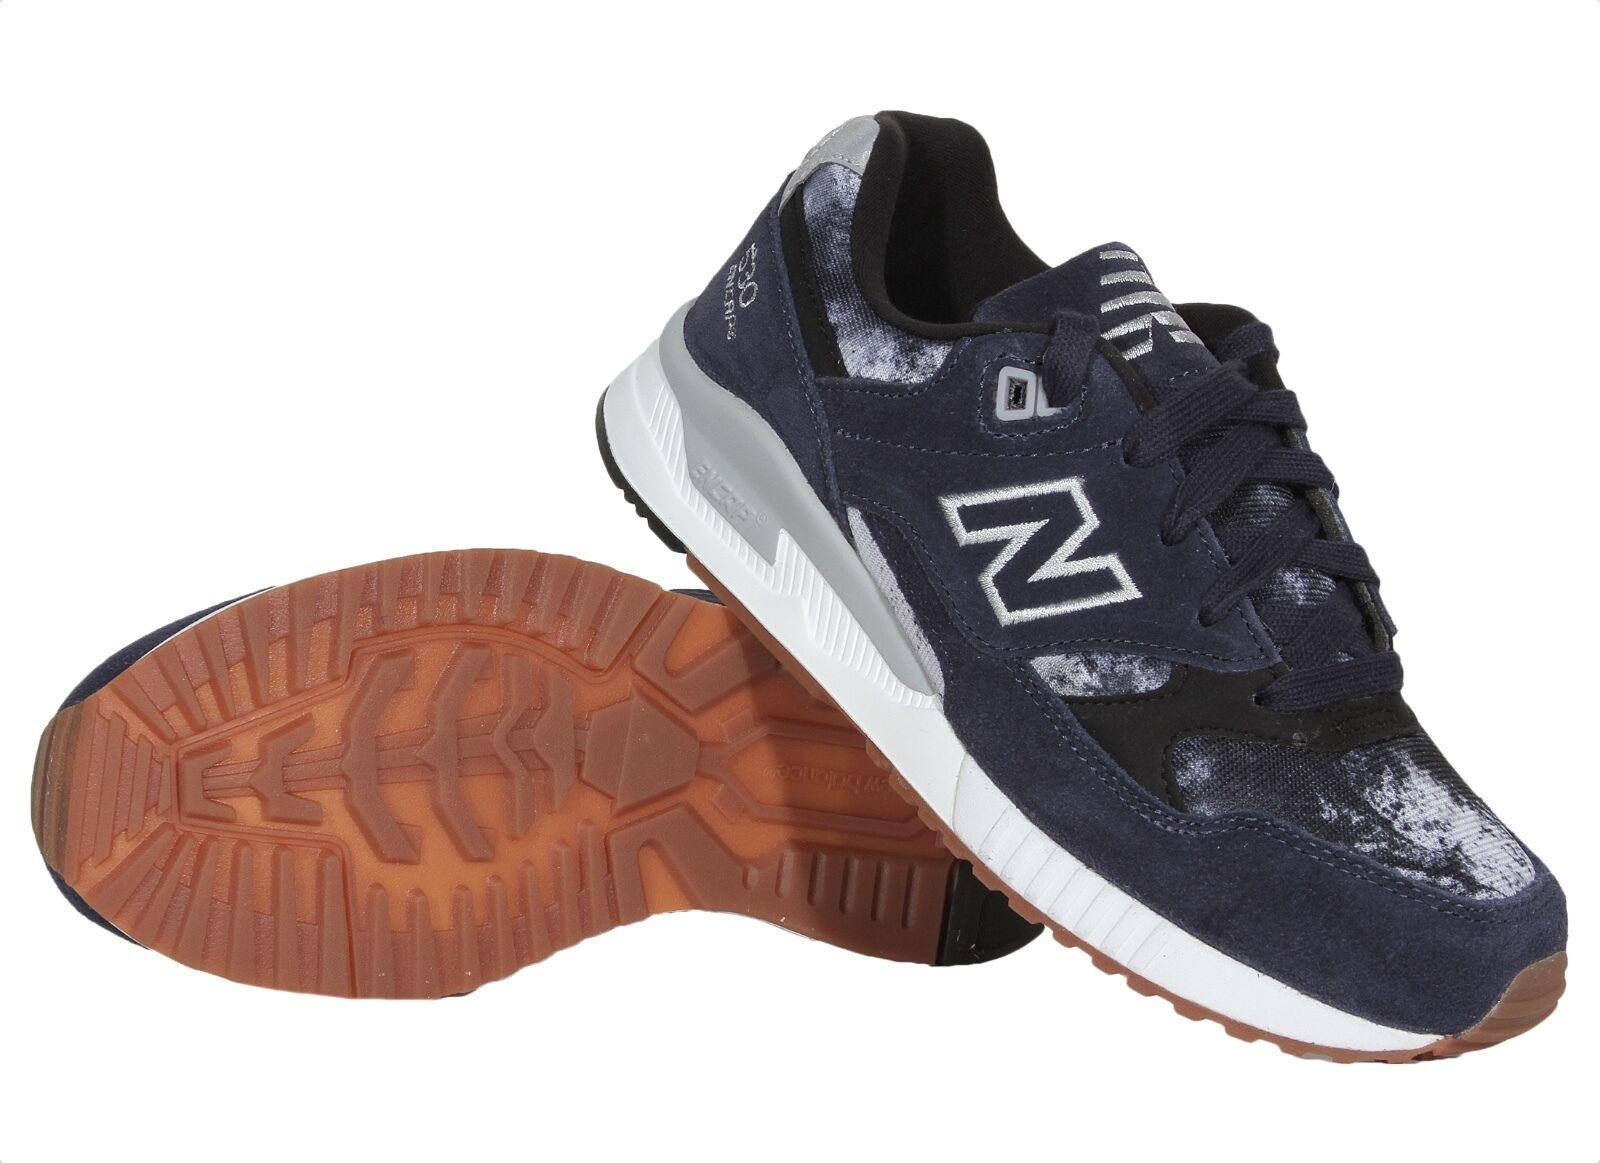 New balance balance balance 530 90S que se ejecuta Classics para Mujer Zapatos de entrenamiento W530BNA Mediano (B, M)  Felices compras